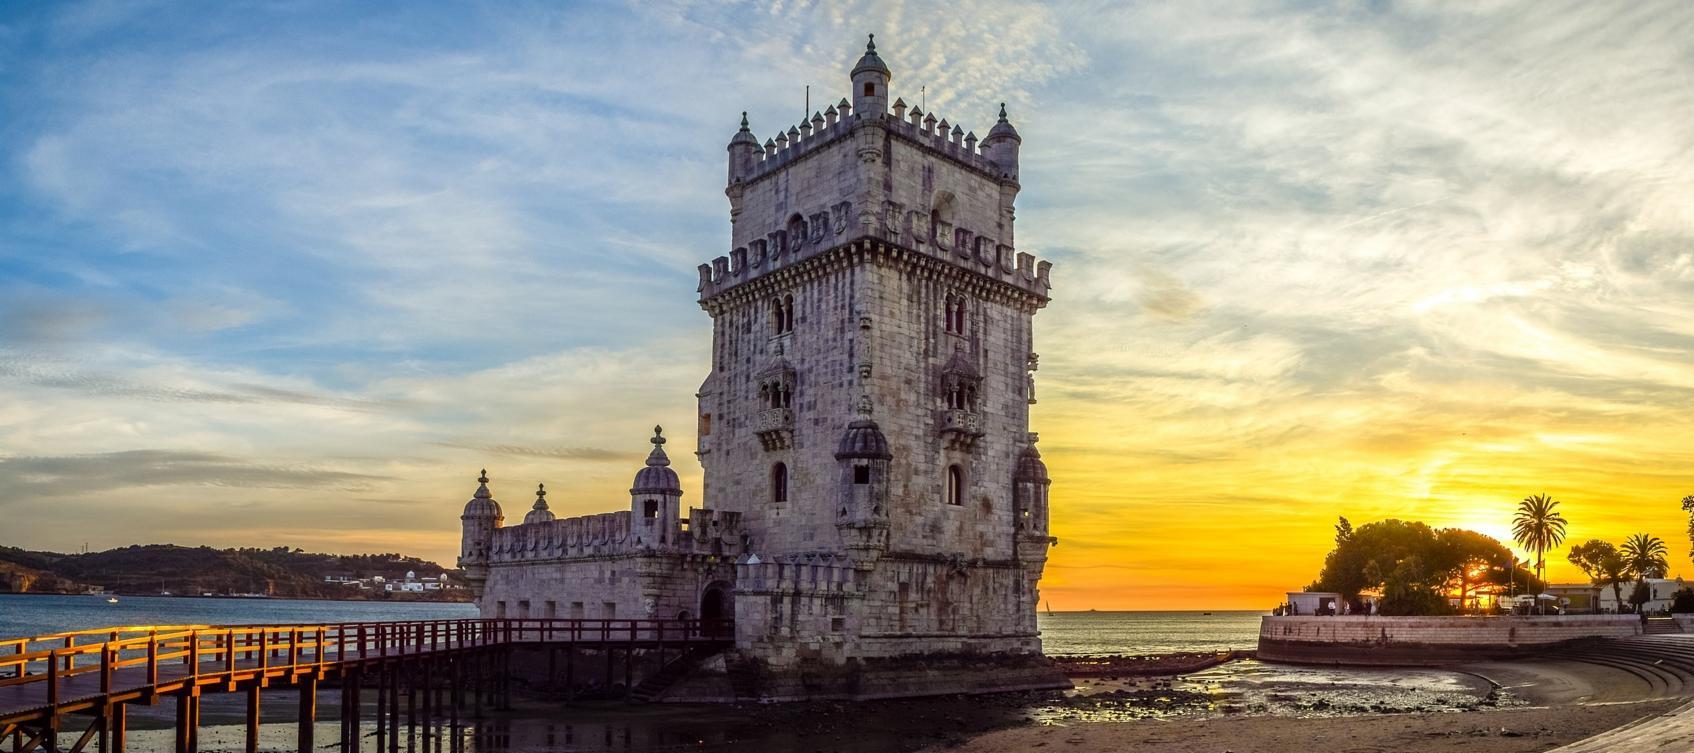 Belém Tower in Lisbon